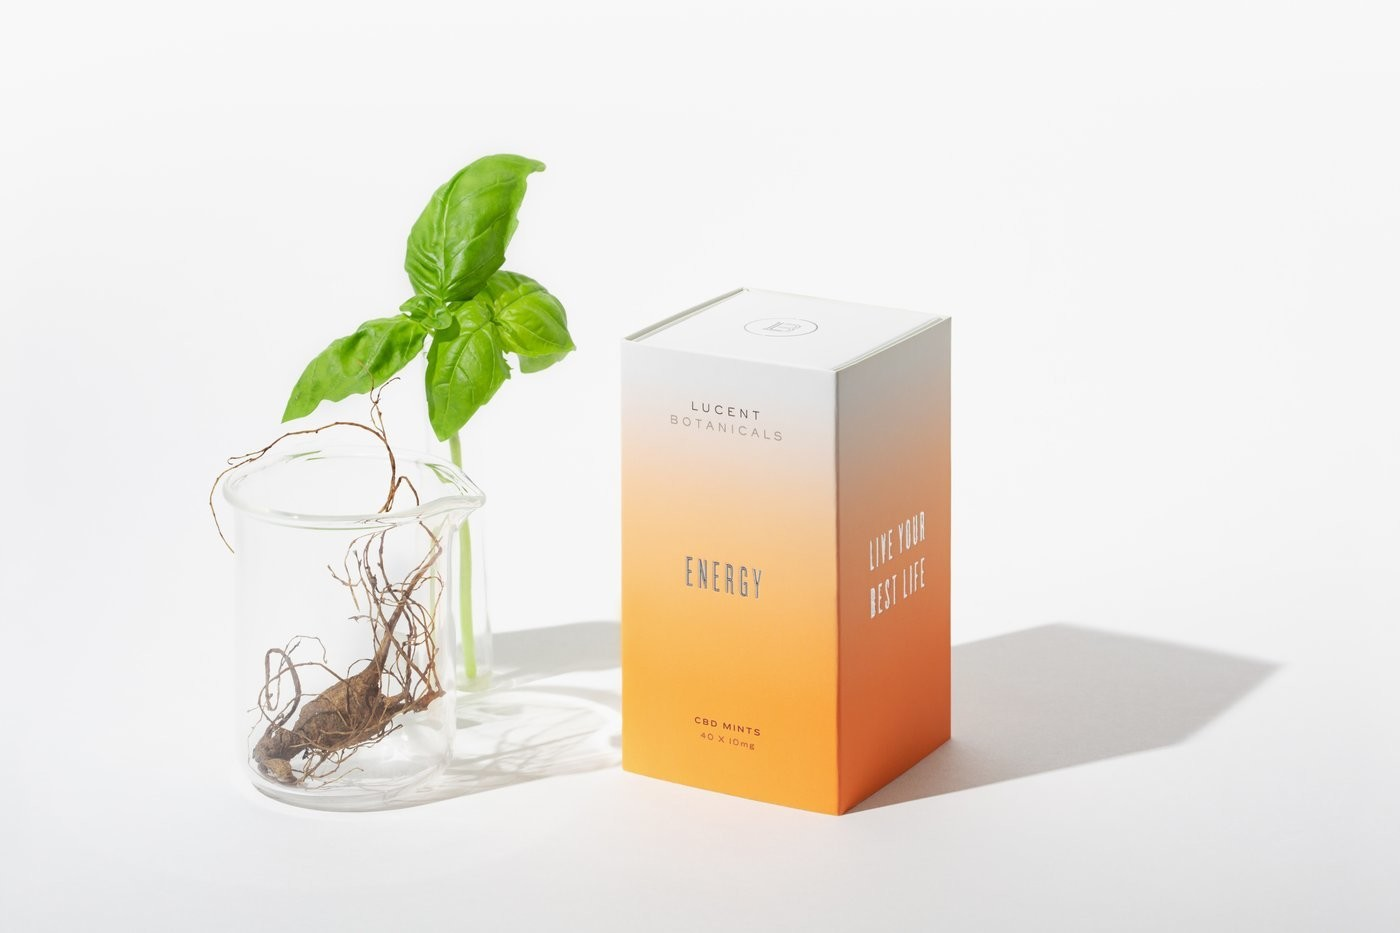 Lucent Botanicals CBD Energy Mints